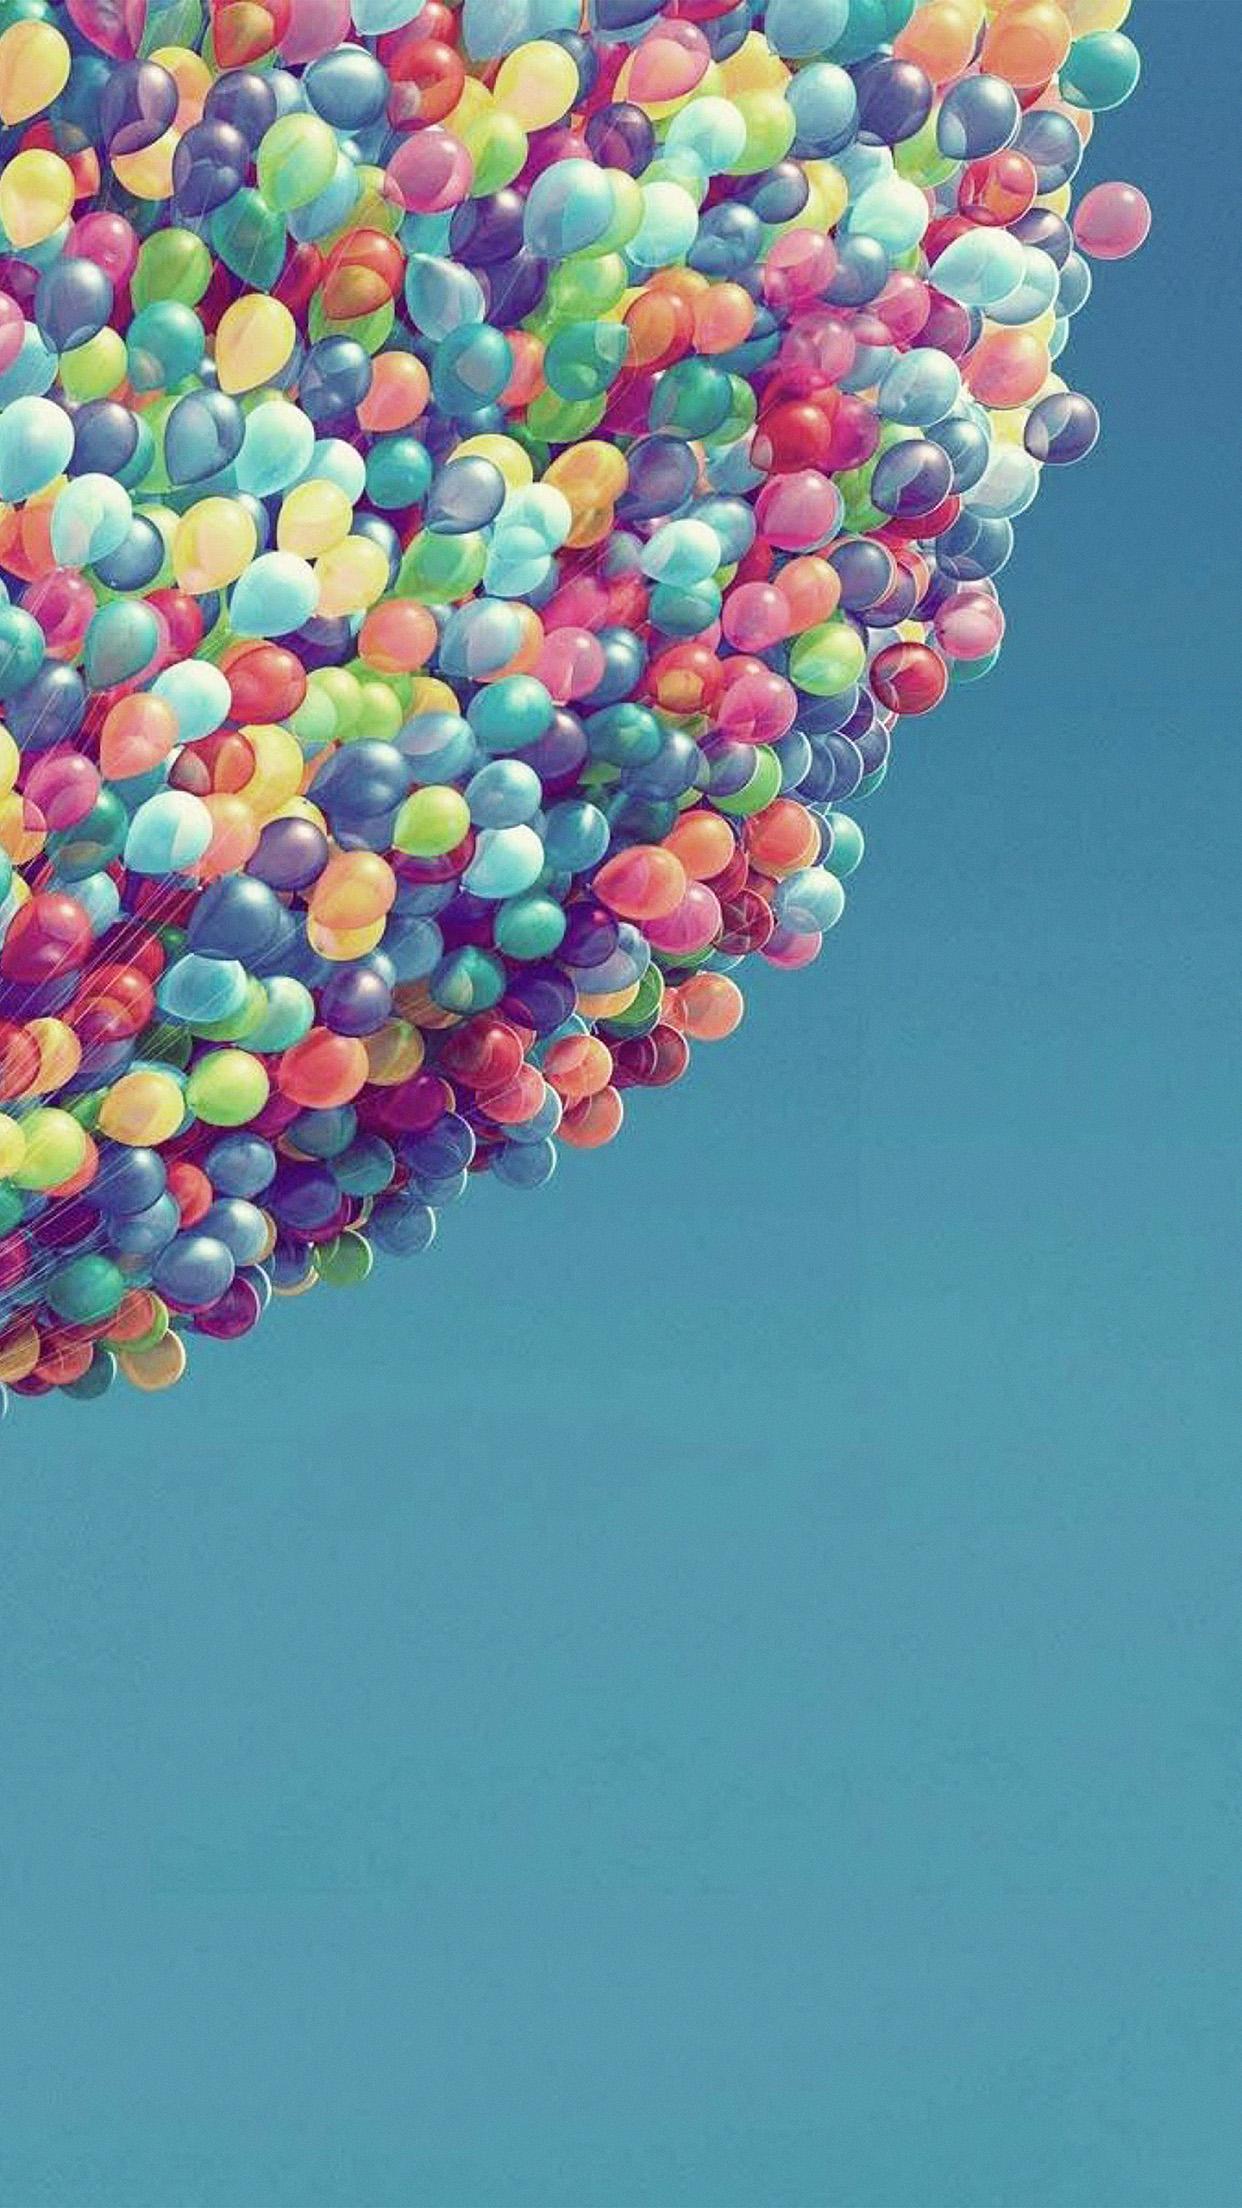 Ax16-bubble-color-blue-sky-illustration-art-wallpaper